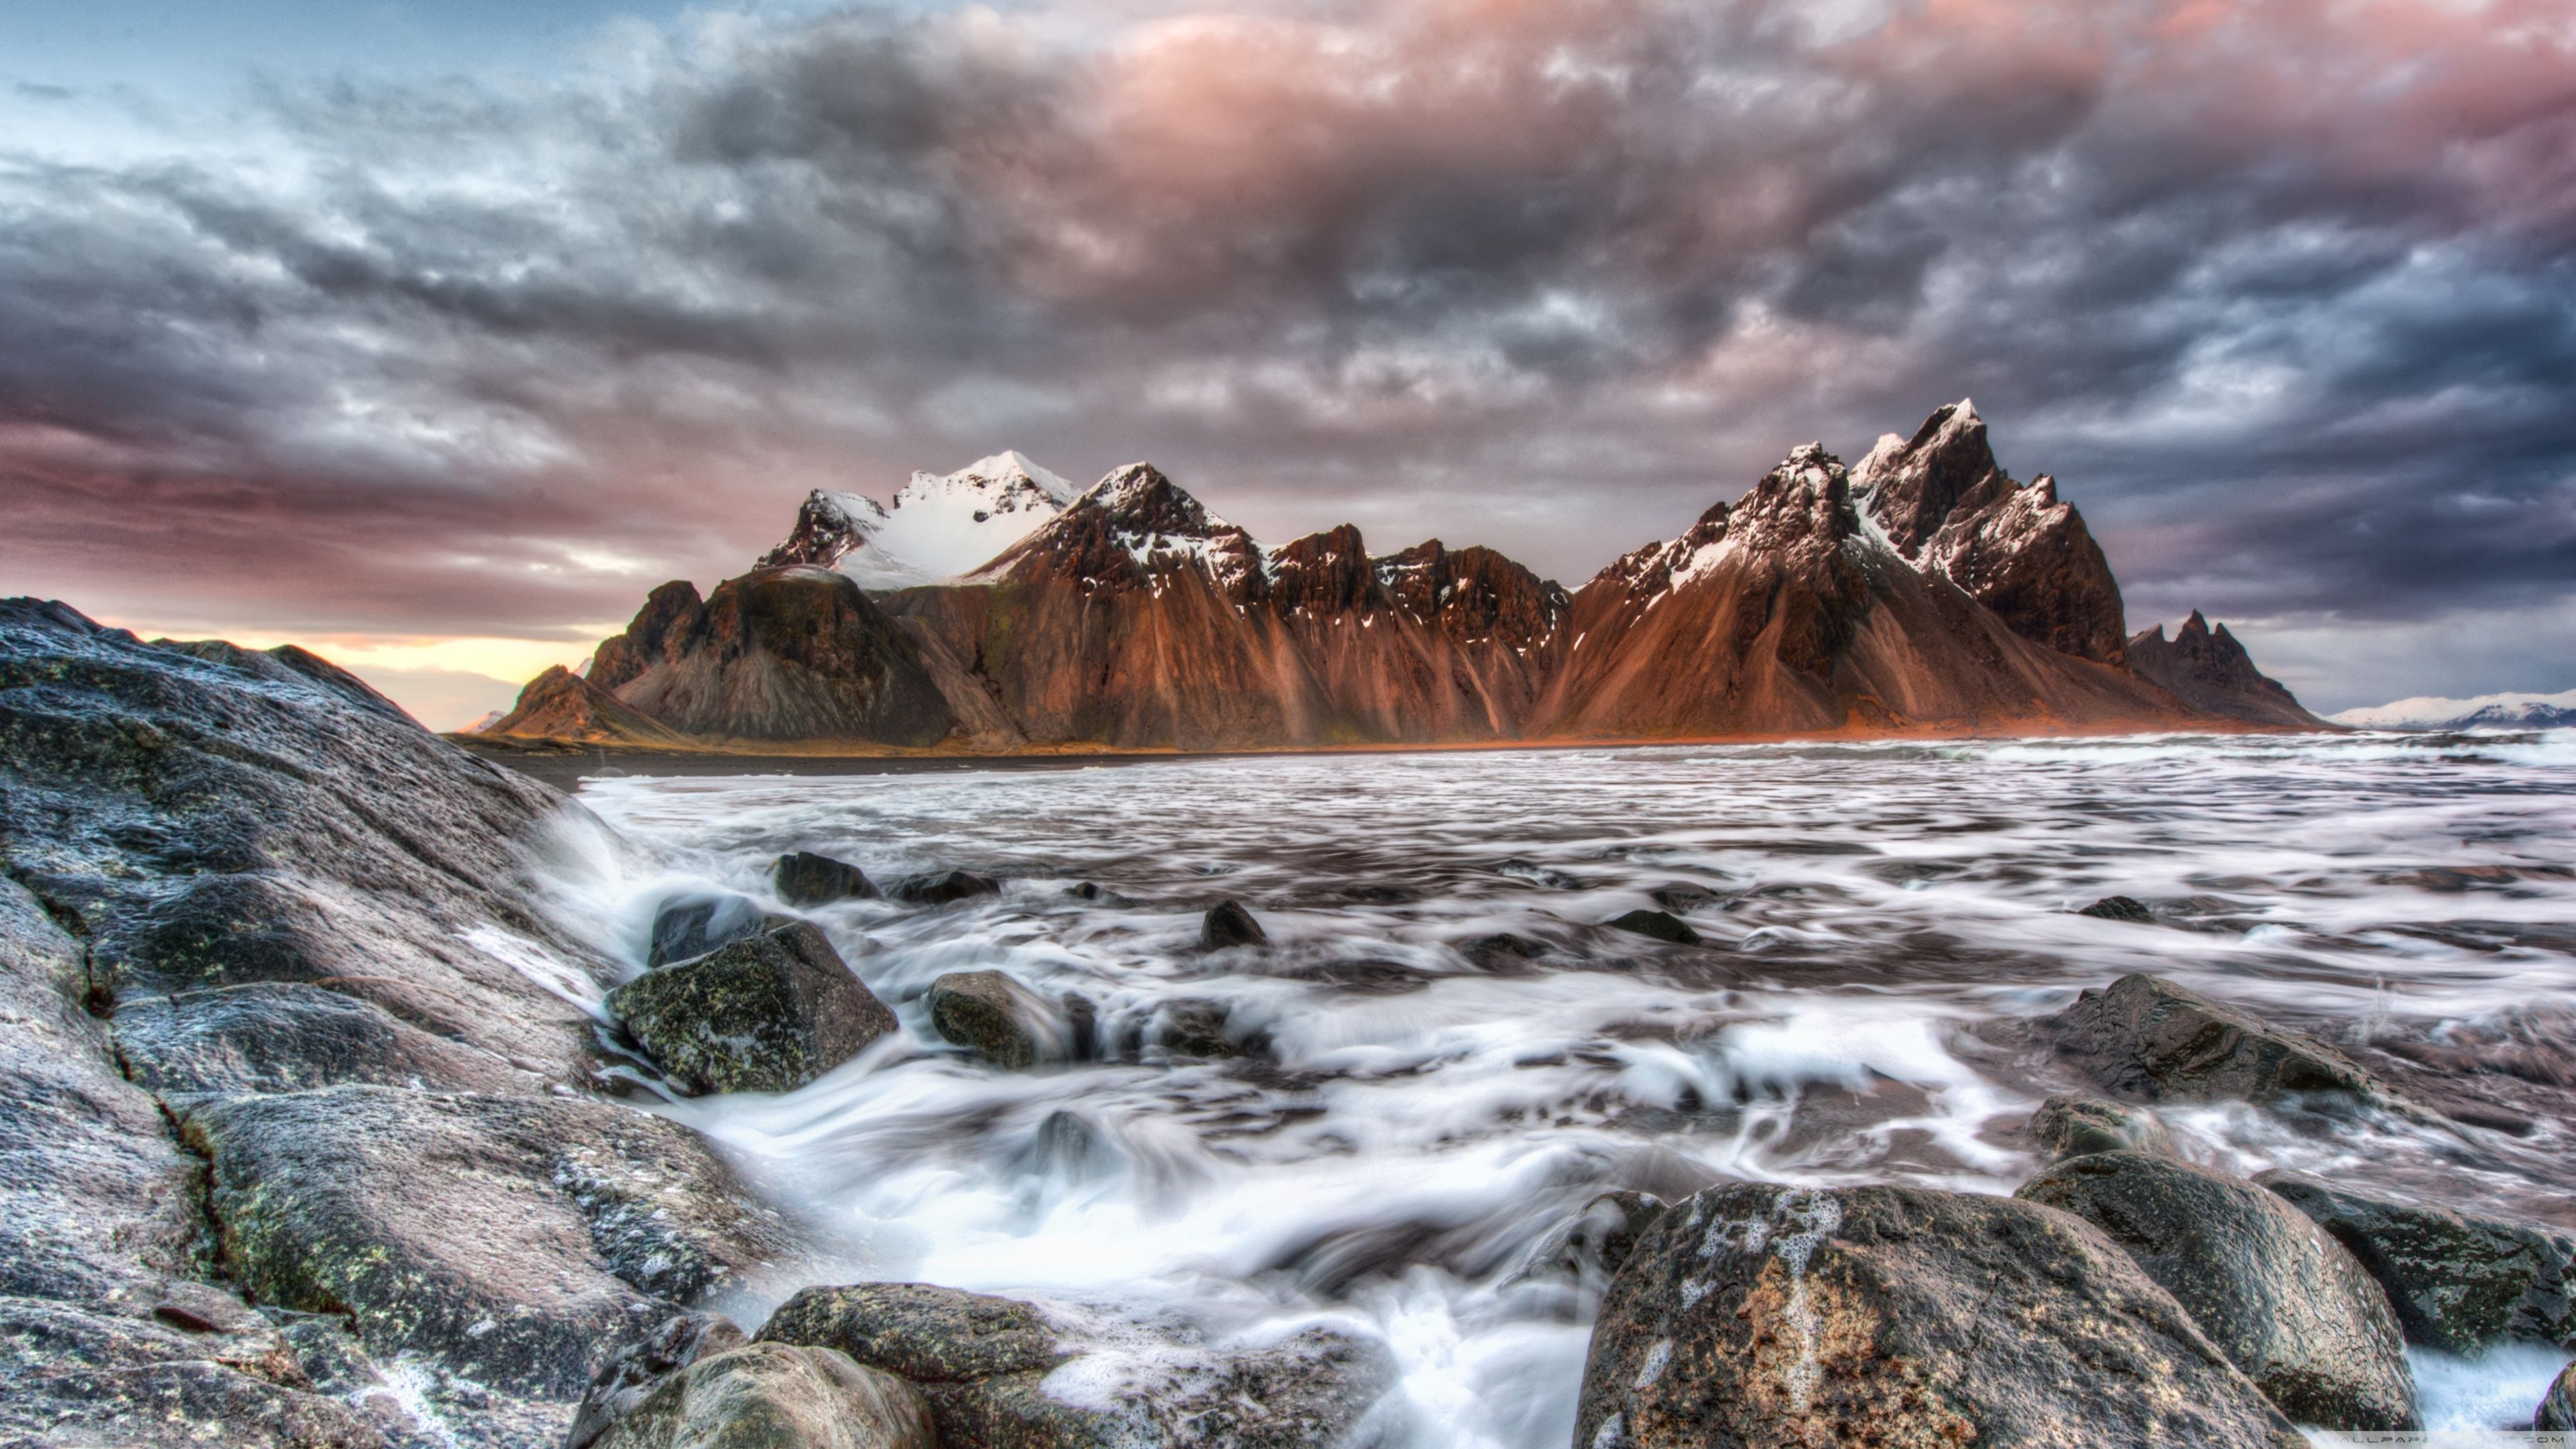 Winding River 4k Hd Desktop Wallpaper For 4k Ultra Hd Tv: Top Free Iceland 4K Backgrounds